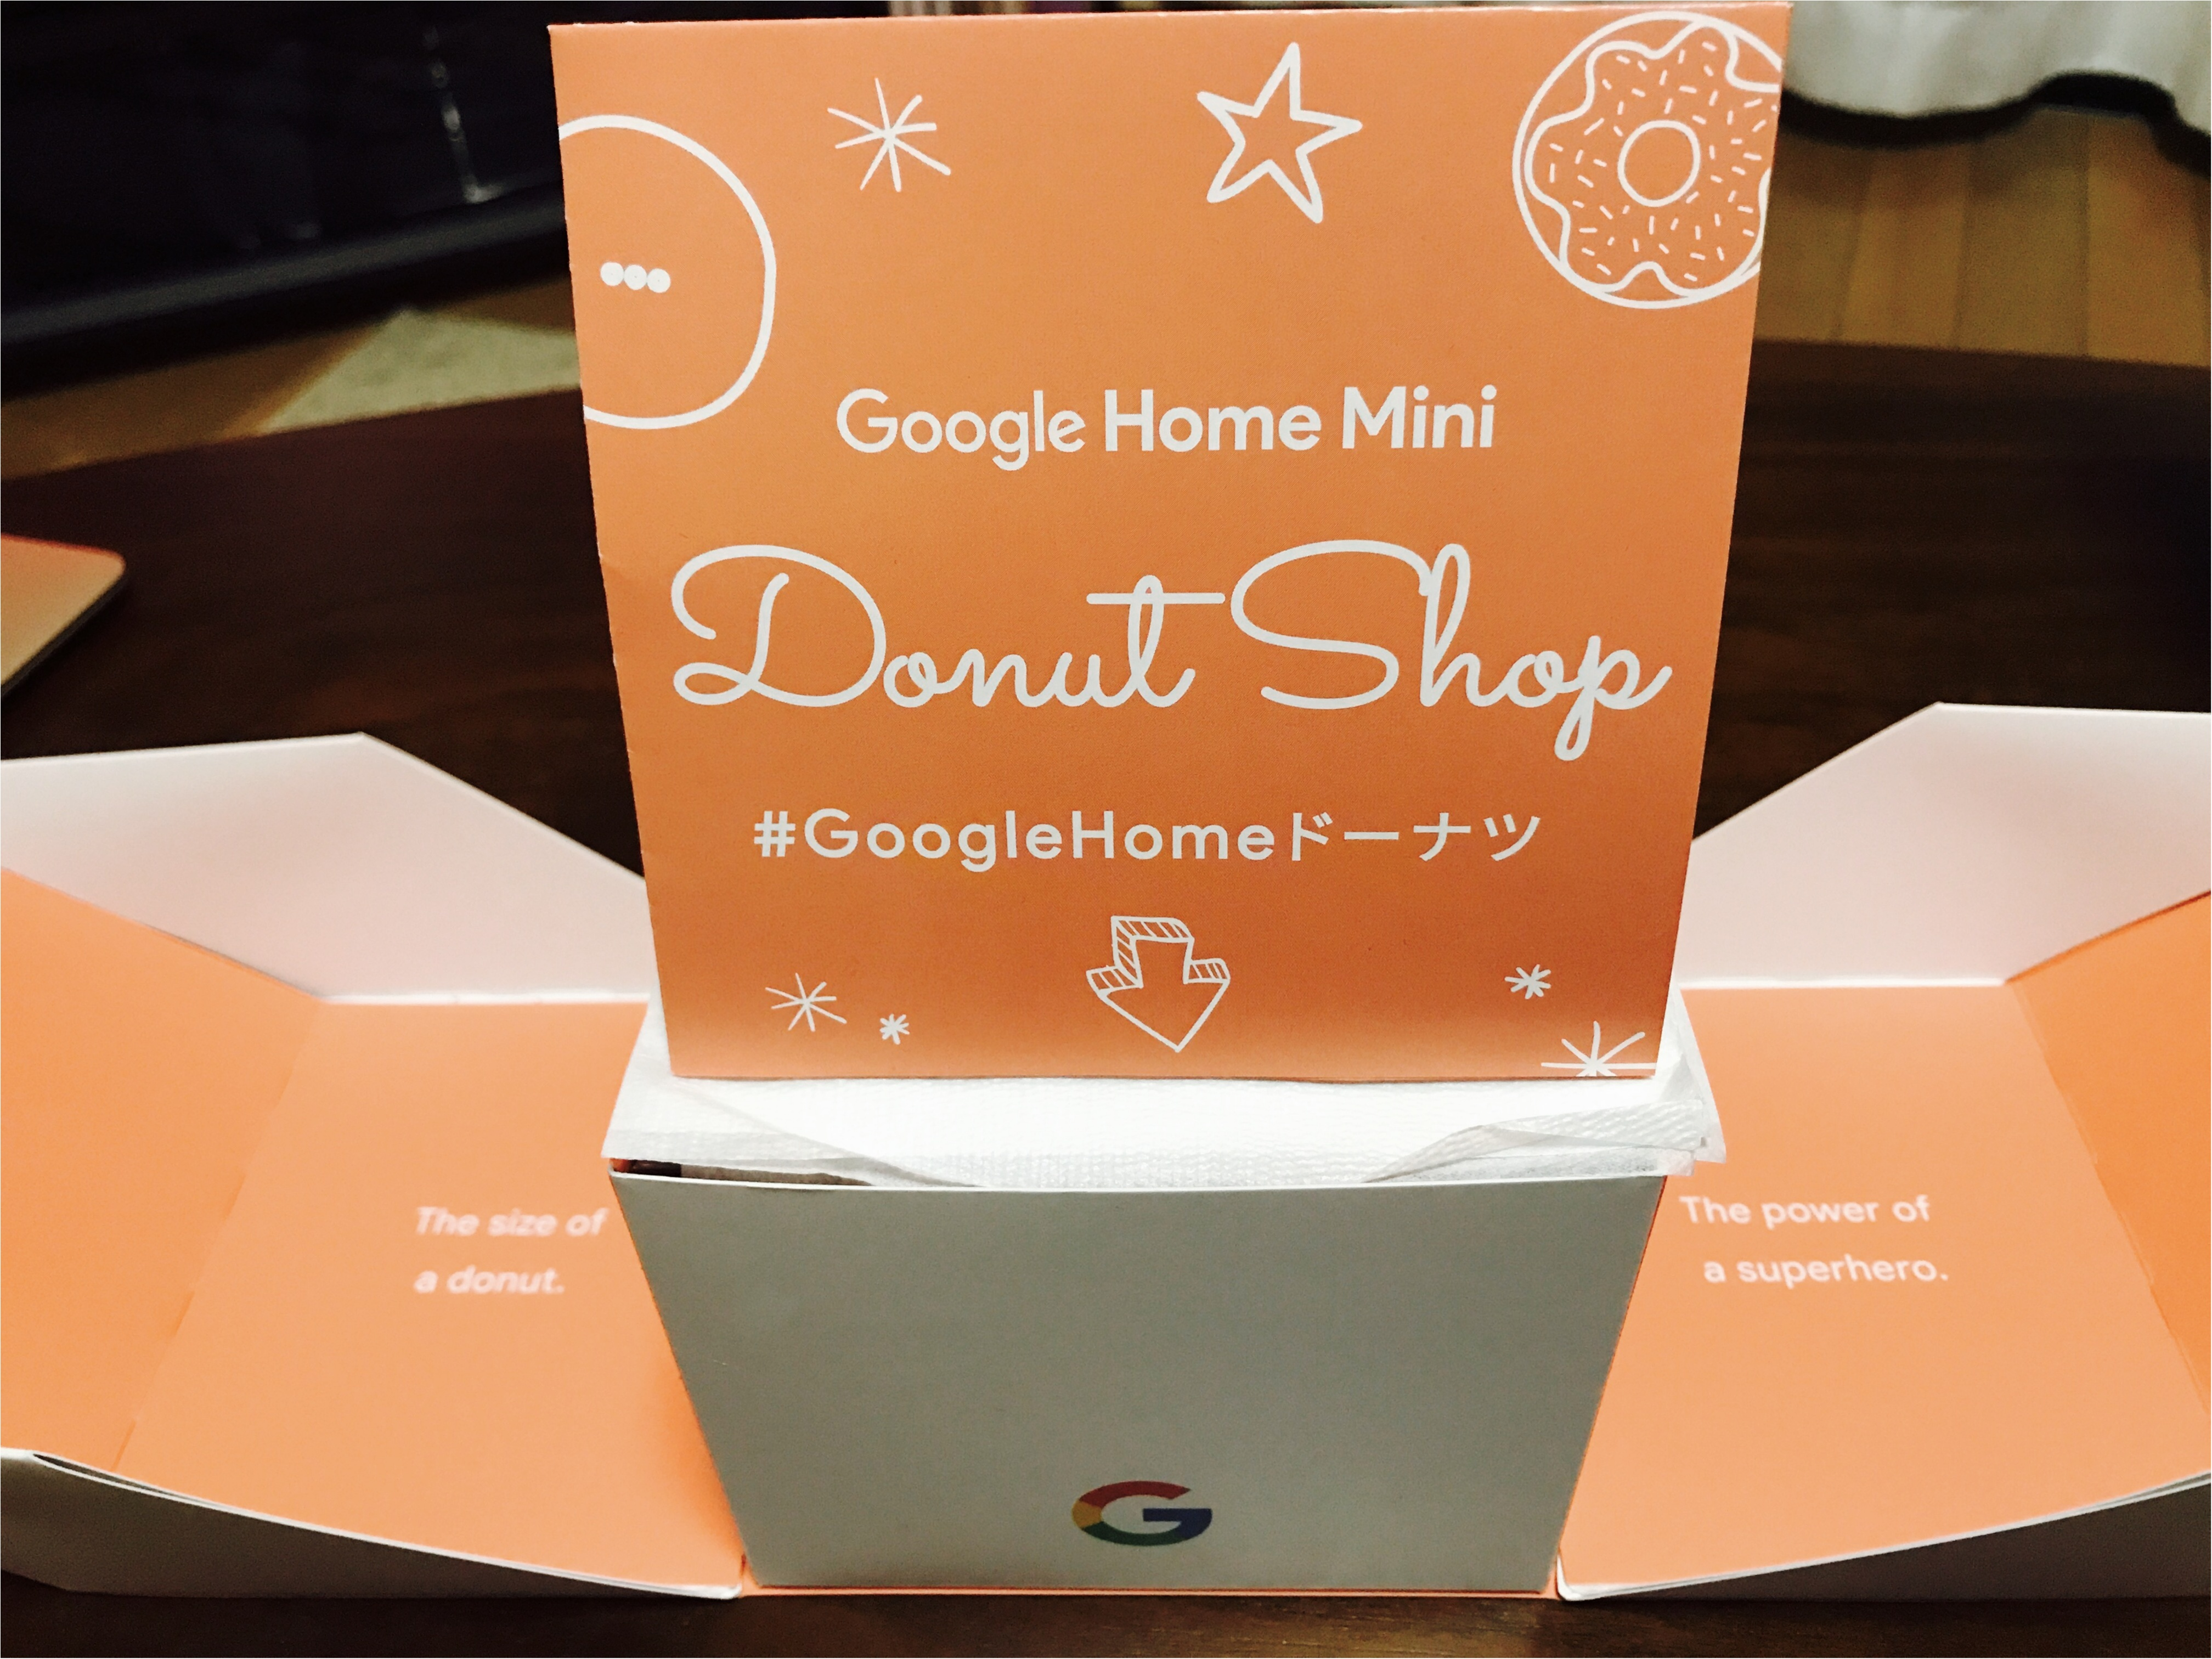 【Google Home Mini ドーナツショップ】《無料!》でドーナツもらえちゃいます!!運が良かったら本物の「Google Home Mini」が当たるかも!?_7